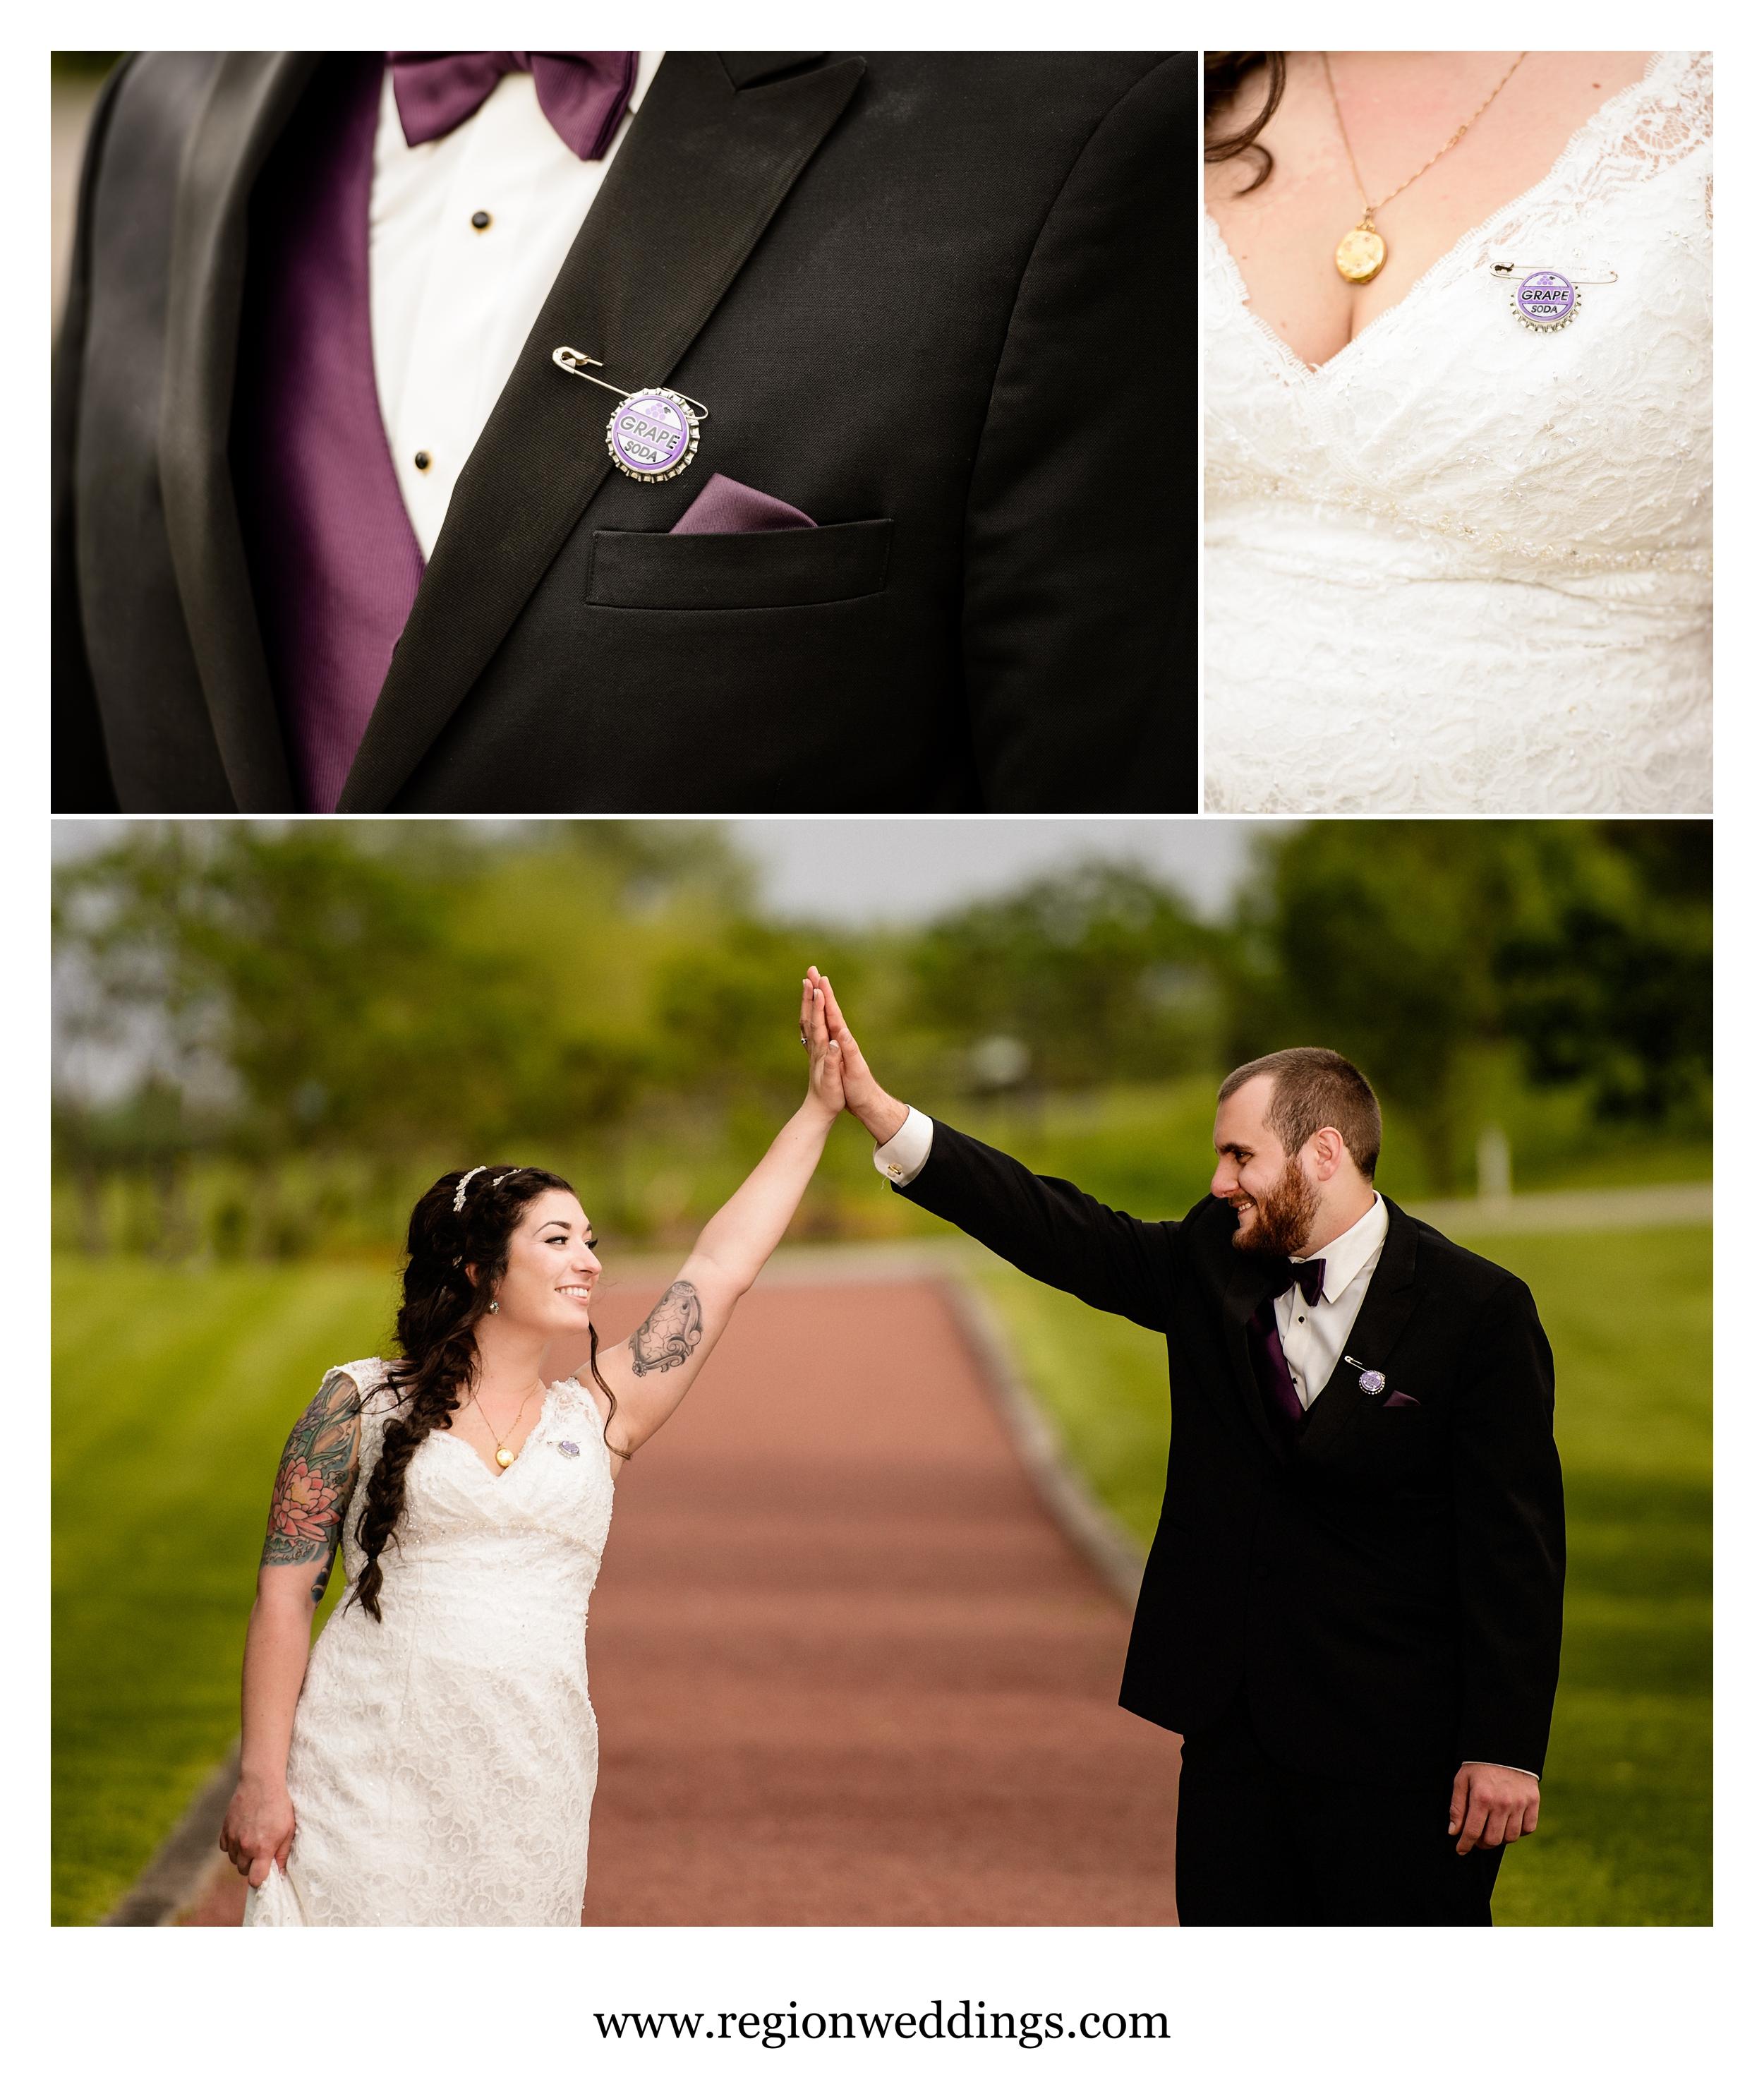 Grape soda and high fives = true love.